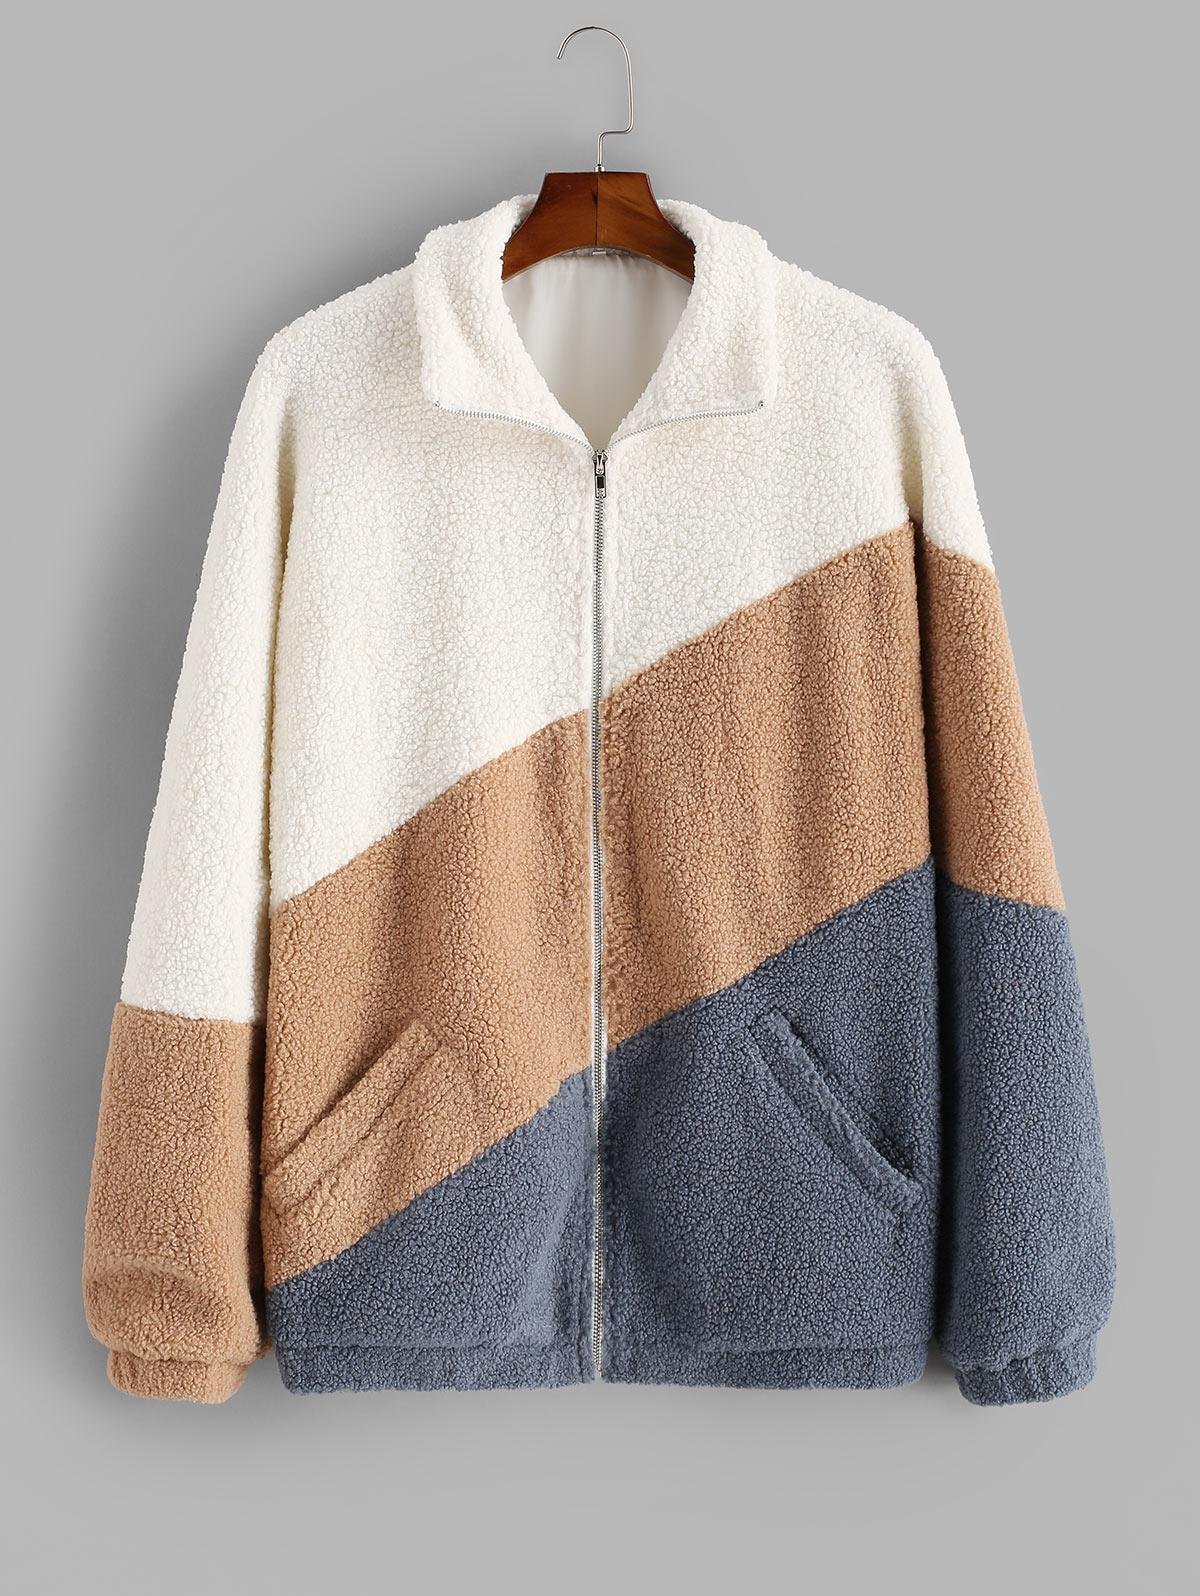 Zaful Colorblock Teddy Jacket